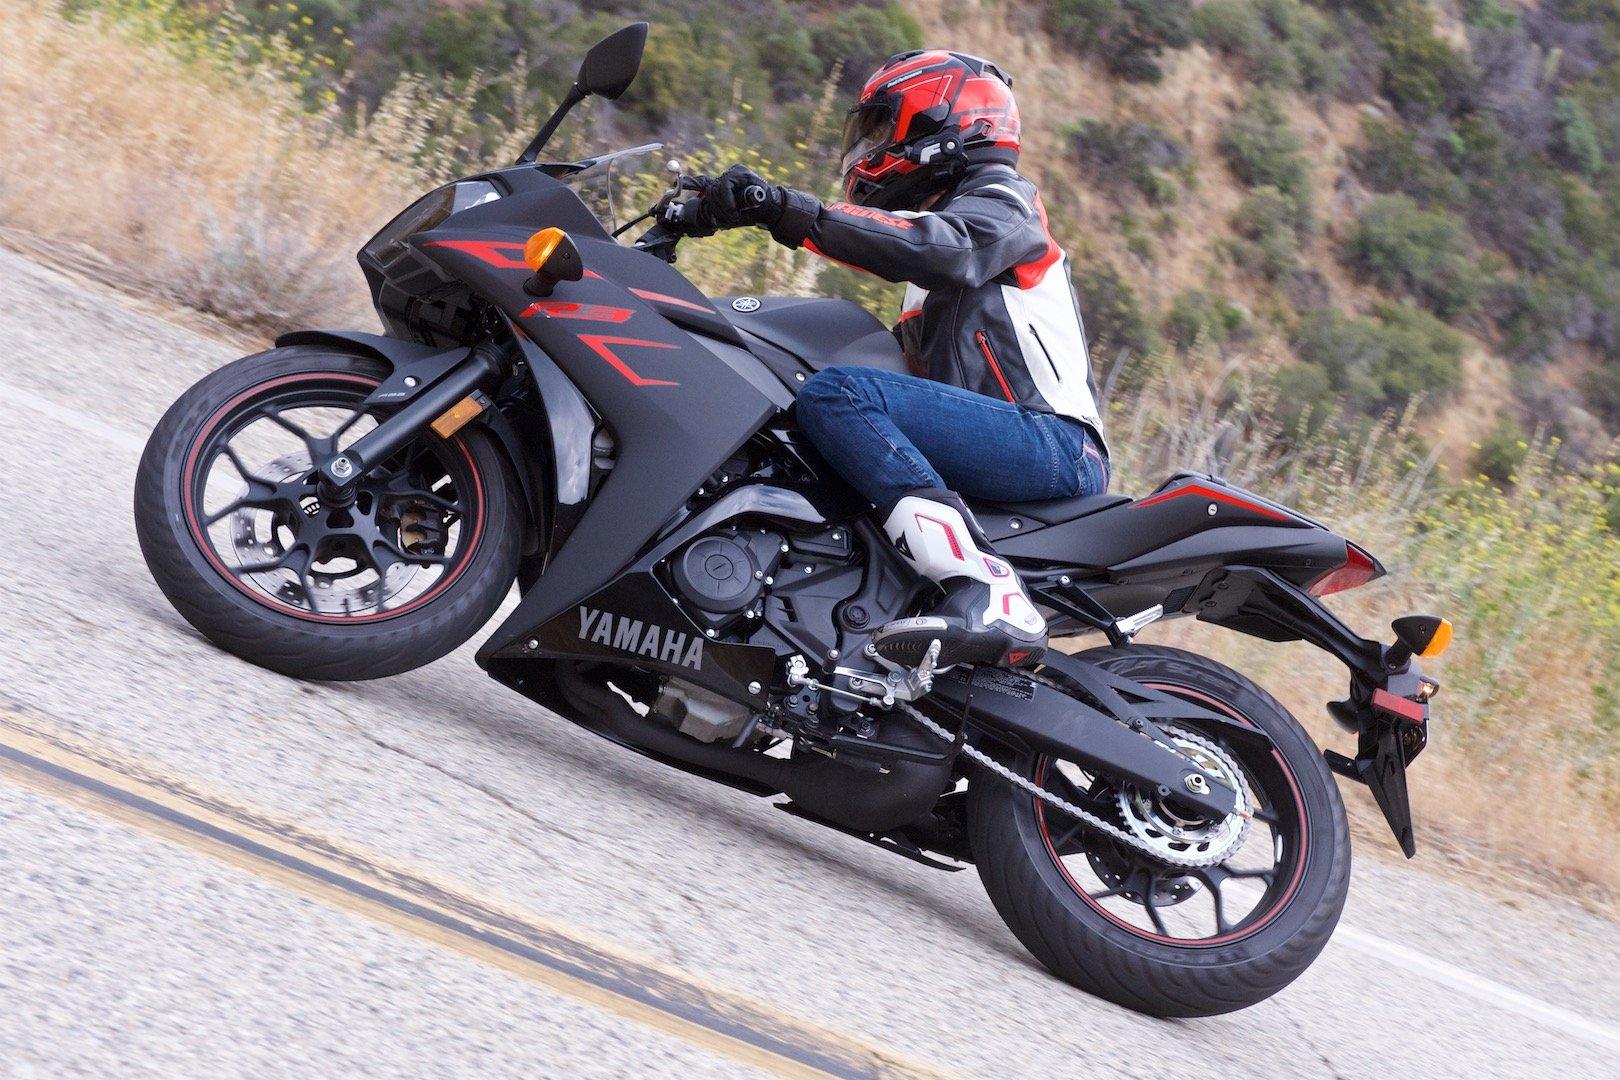 2017 Yamaha YZF-R3 top speed